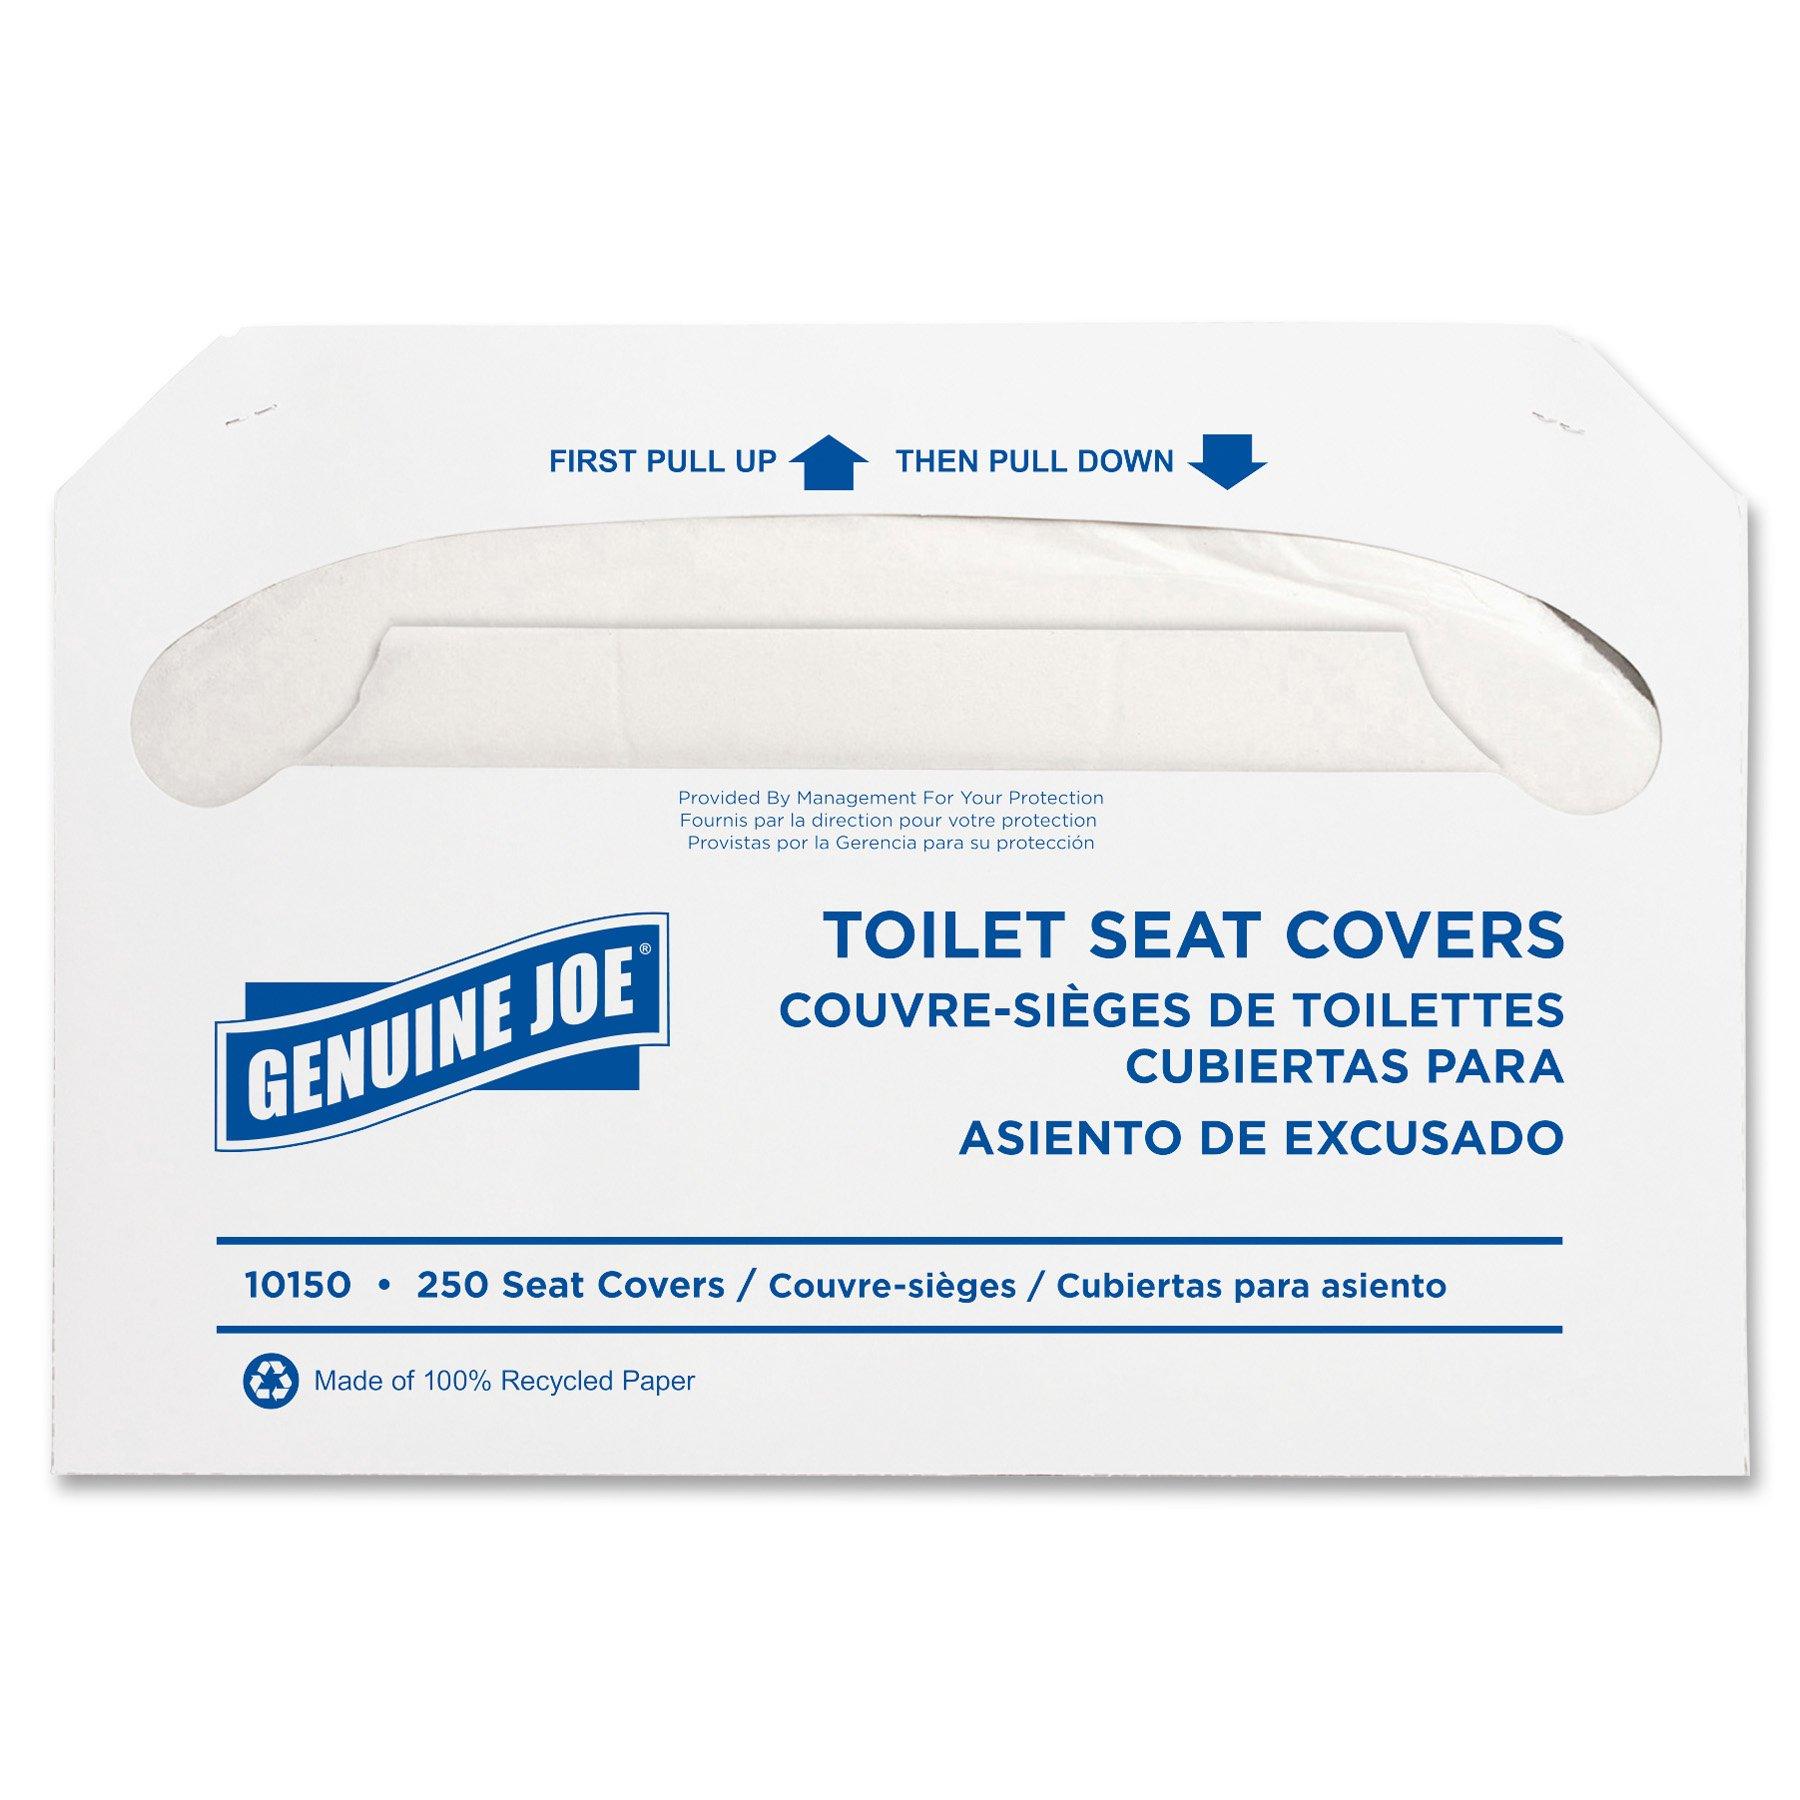 Genuine Joe GJO10150 Recycled Toilet Seat Cover, White (Case of 2500) by Genuine Joe